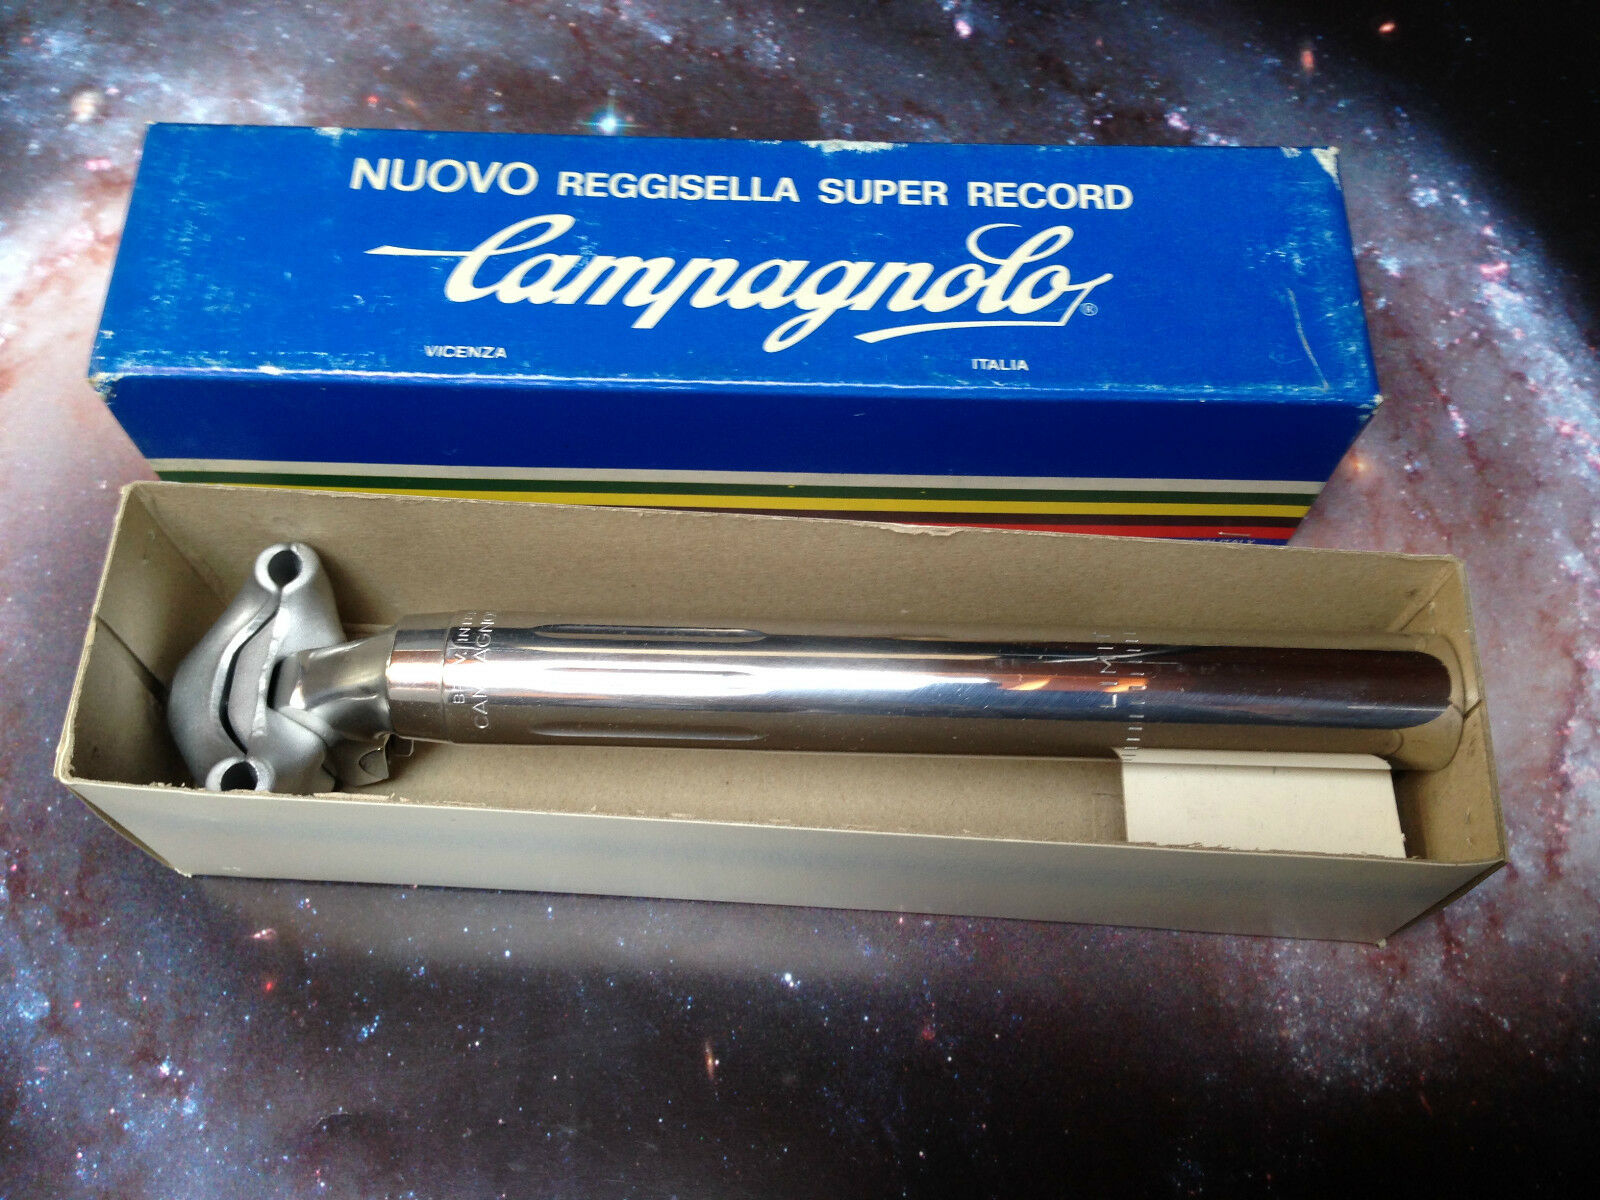 Campagnolo Reggisella NUOVO Super  Record 25mm seatpost ALAN STELBEL VITUS  sales online